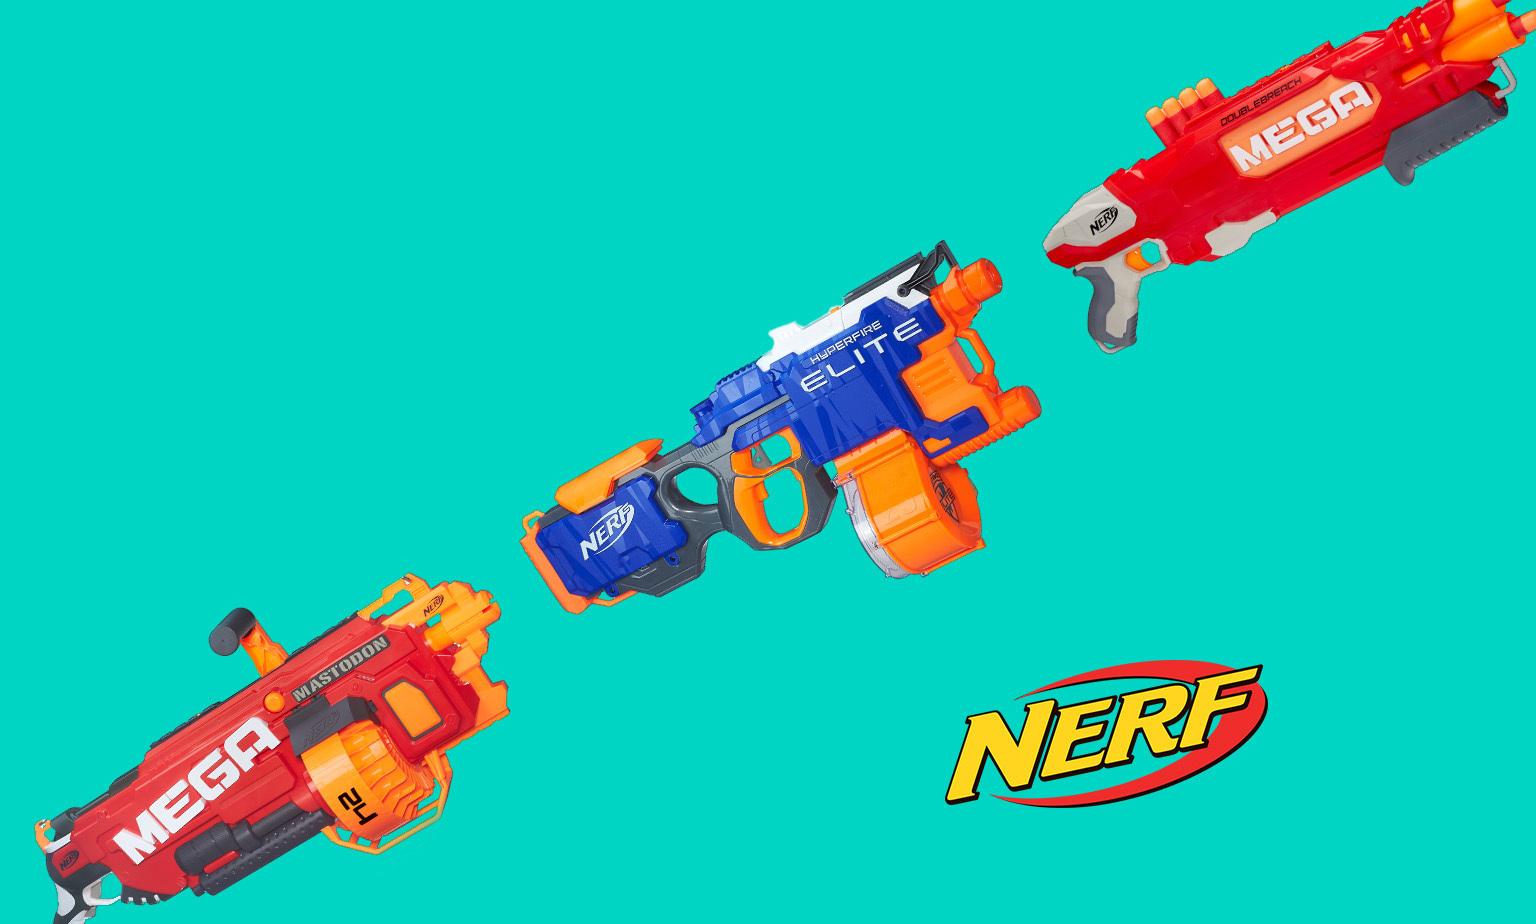 20% off* Nerf!